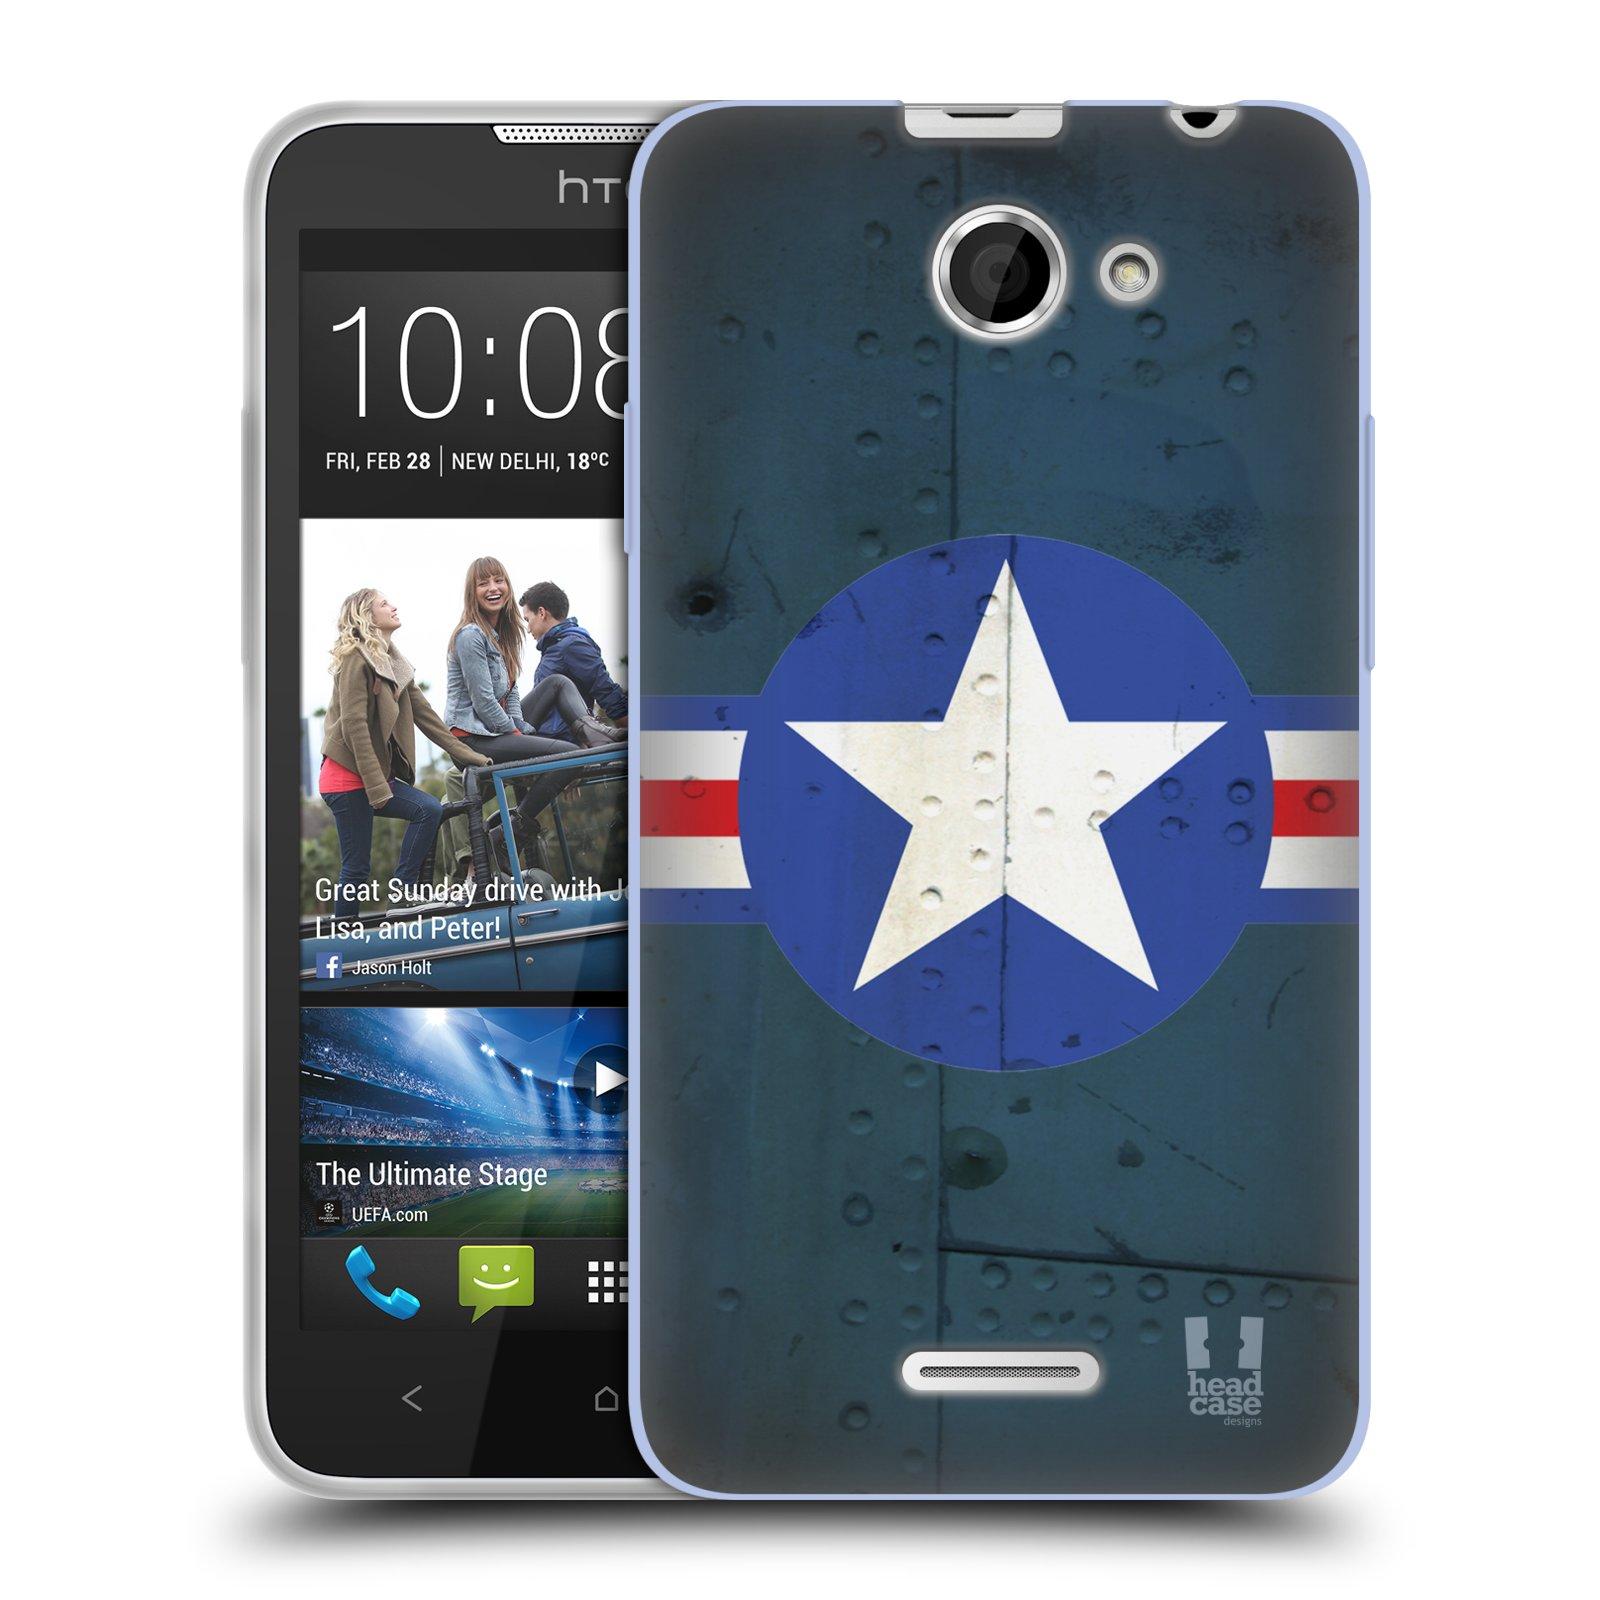 Silikonové pouzdro na mobil HTC Desire 516 HEAD CASE POSTWAR (Silikonový kryt či obal na mobilní telefon HTC Desire 516 Dual SIM)